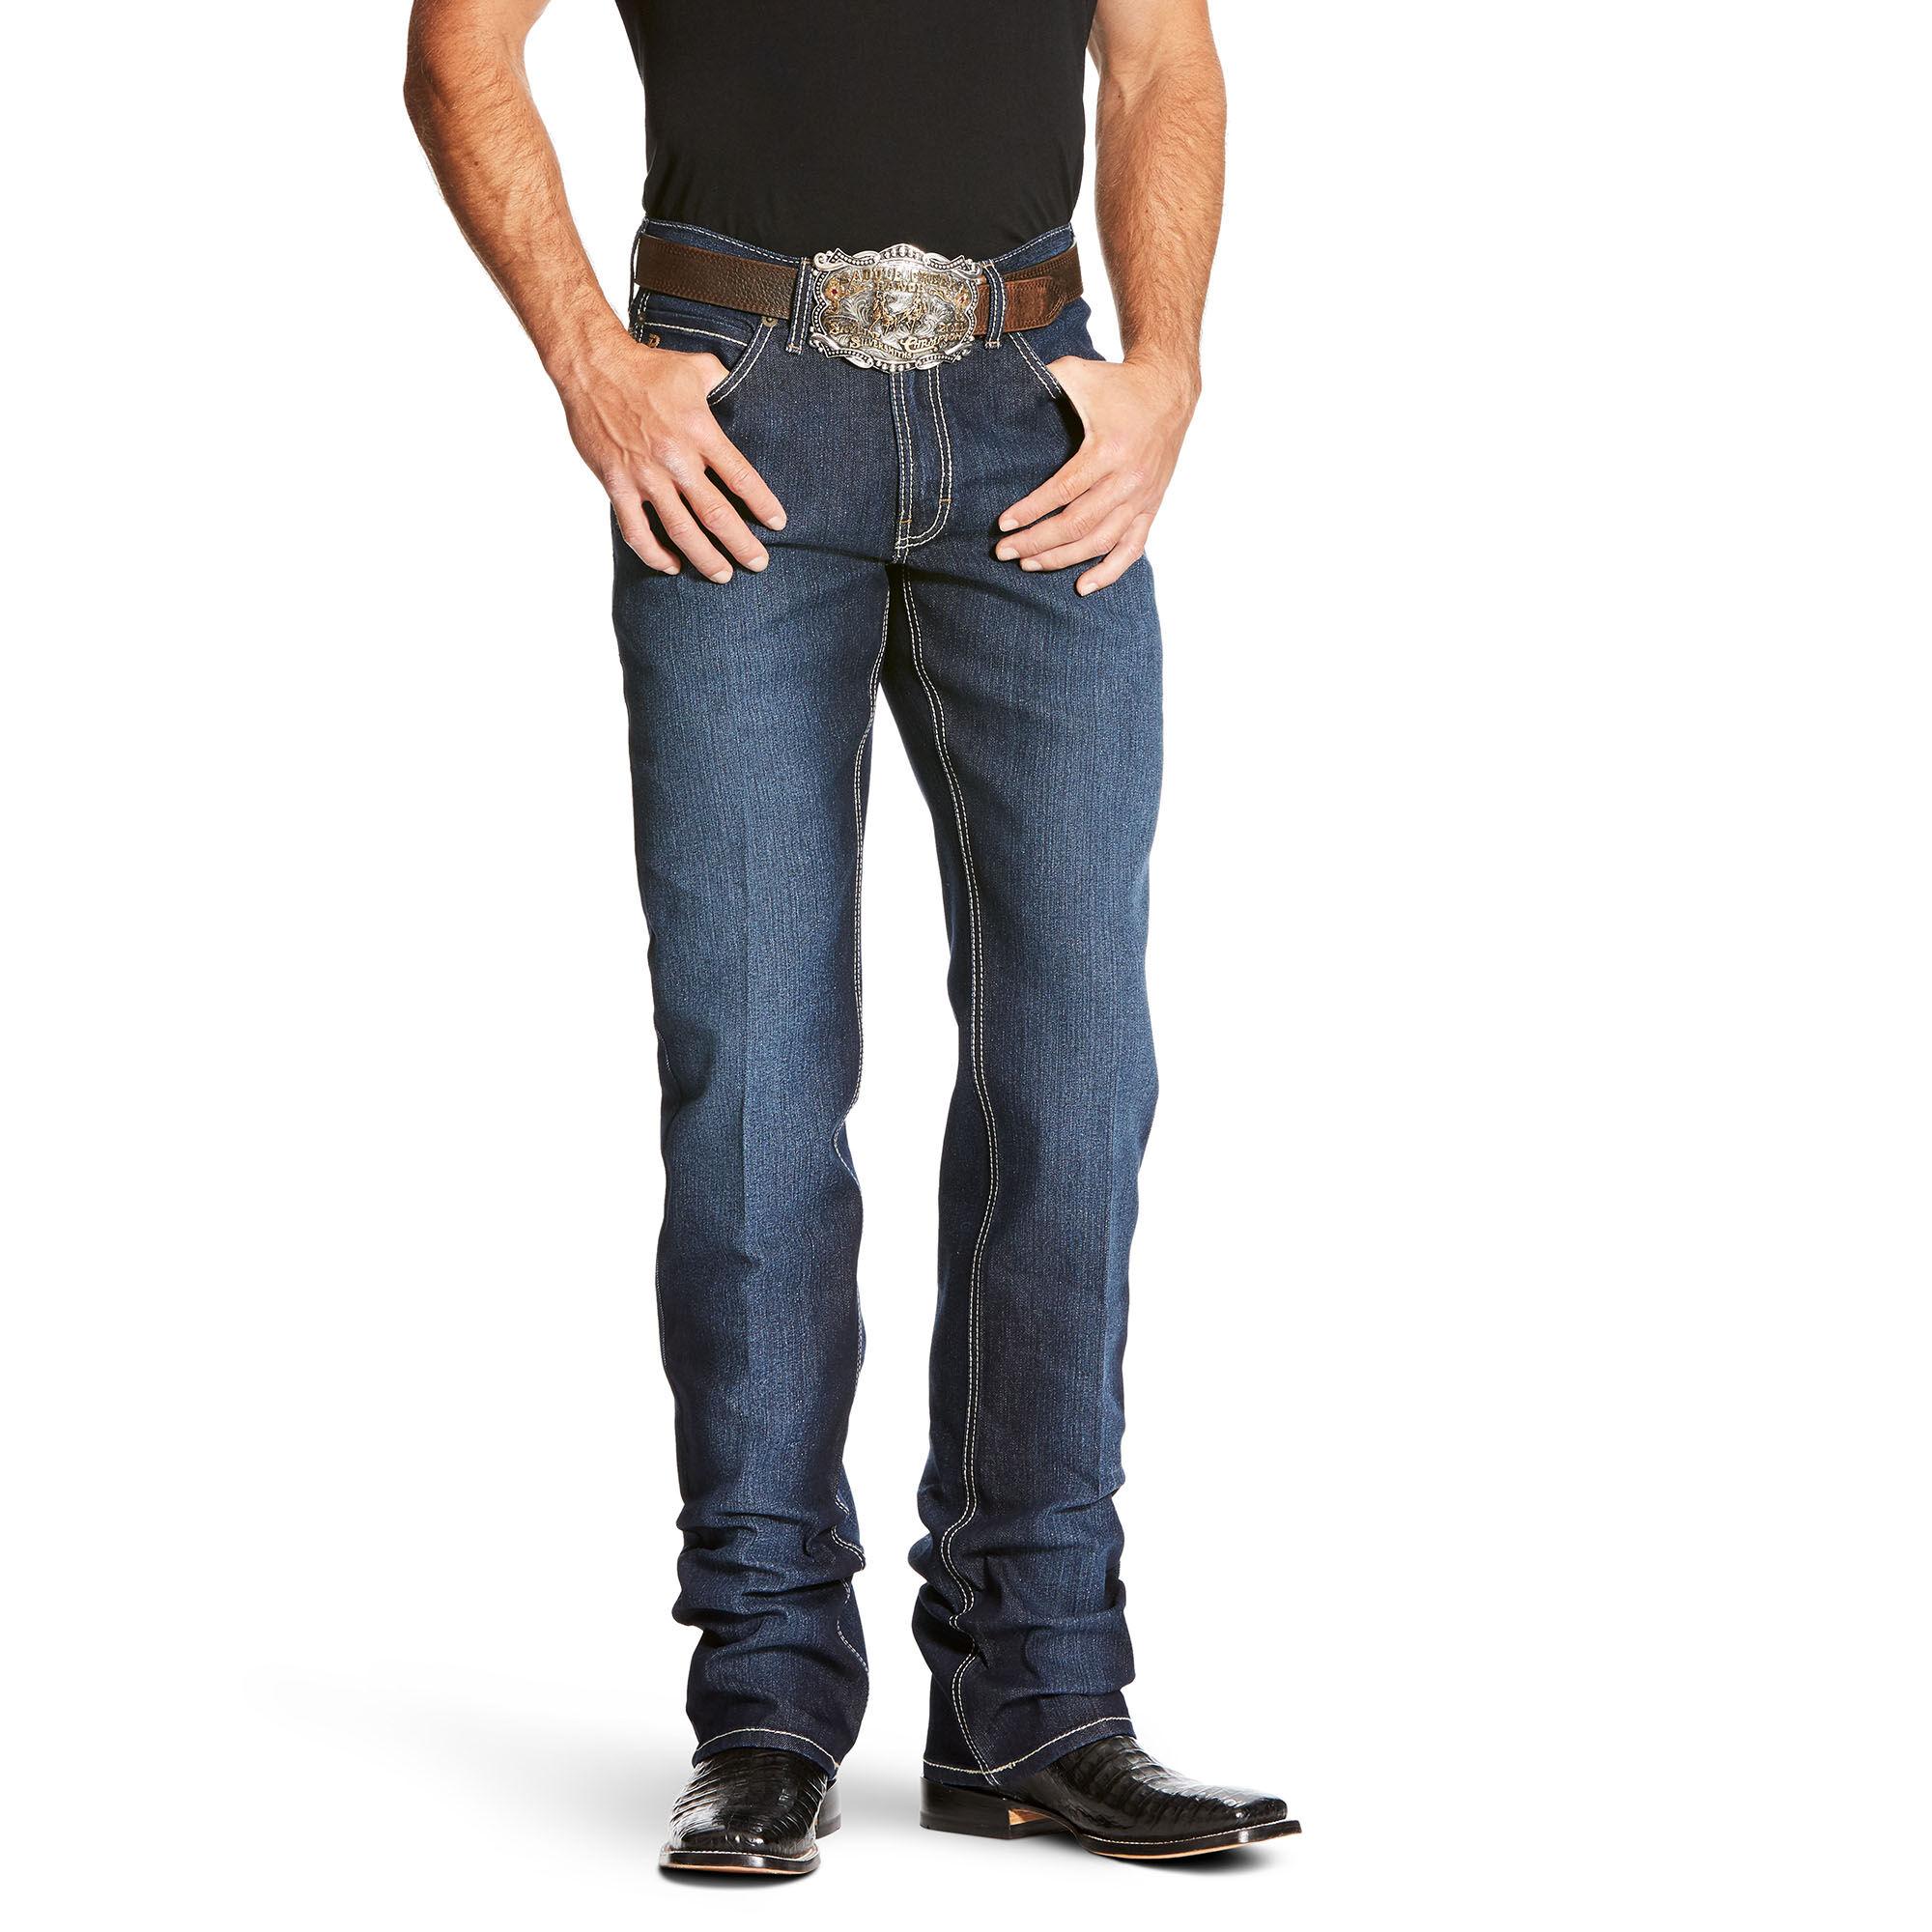 a0797155d91 Relentless Original Fit Caleb Performance Stretch Stackable Straight Leg  Jean